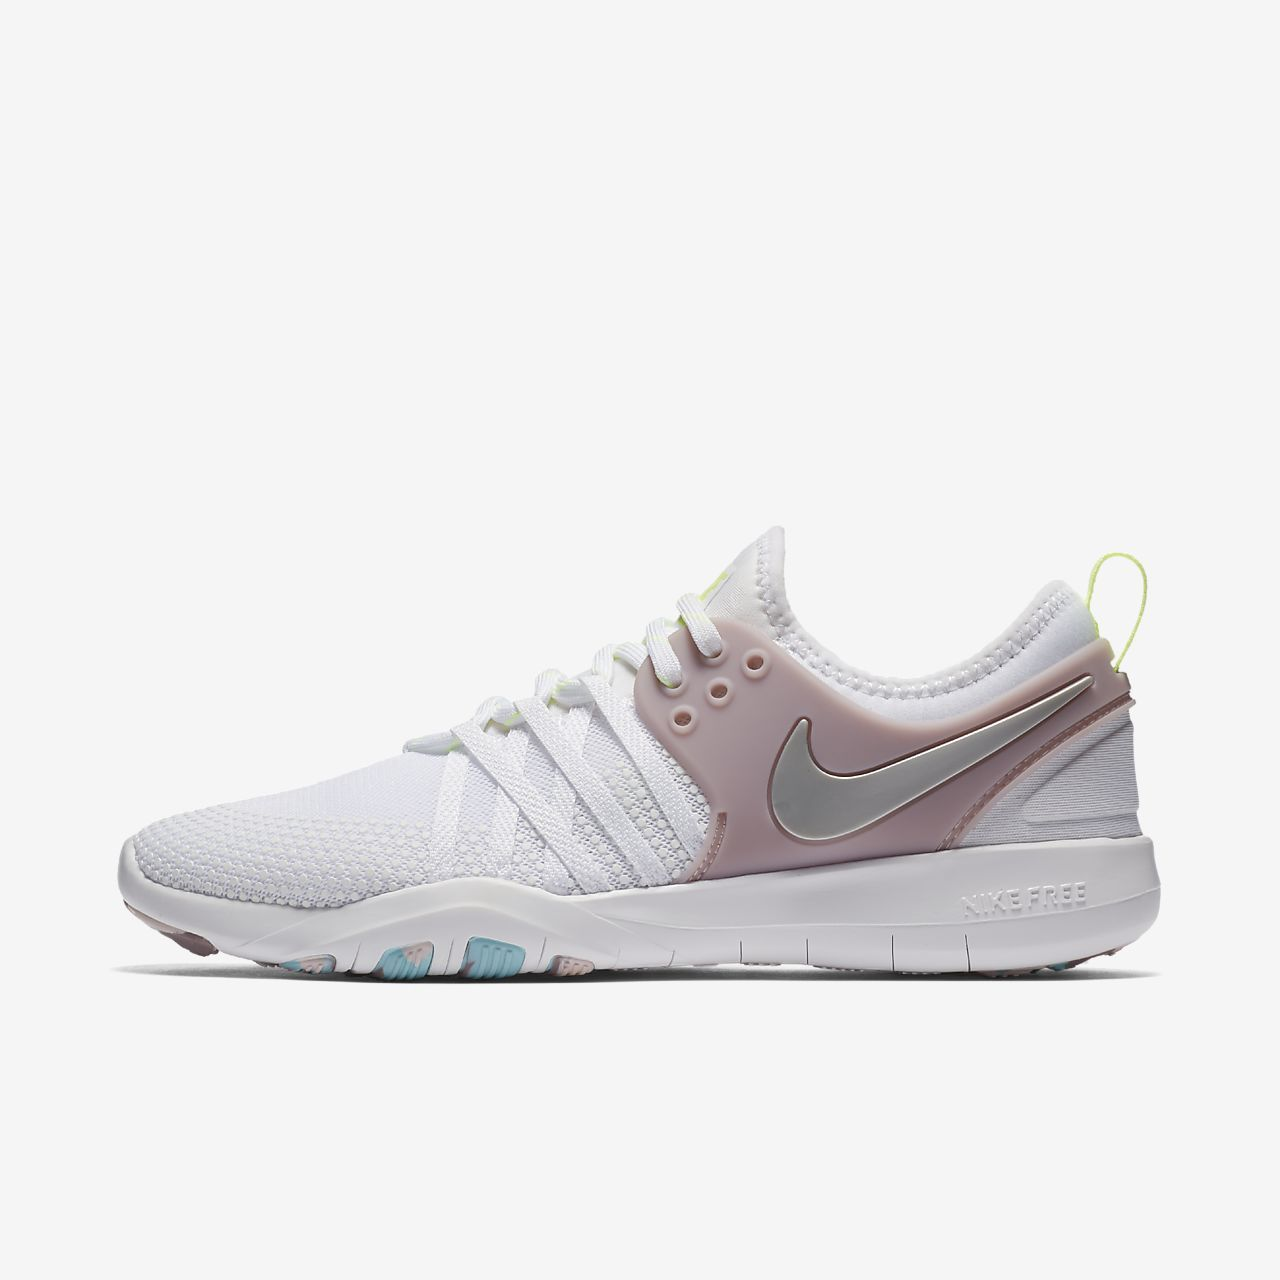 739d8ef7653 Nike Free TR7 Women s Training Shoe